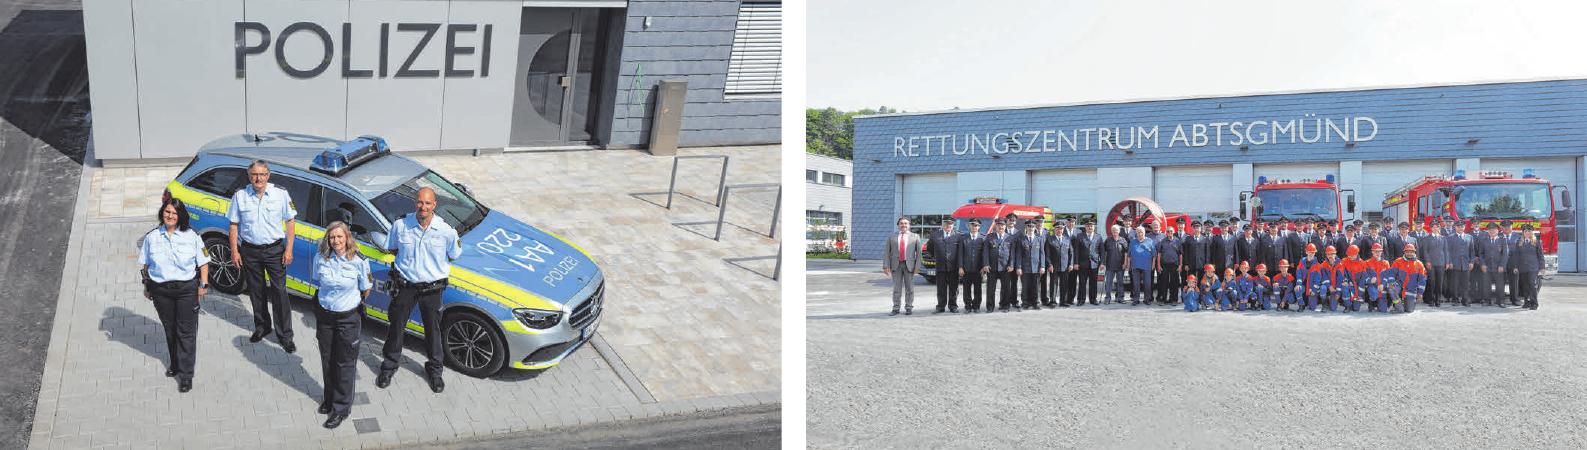 Das neue Rettungszentrum an der B19 in Abtsgmünd umfasst insgesamt 7300 Quadratmeter. FOTOS: PETER KRUPPA